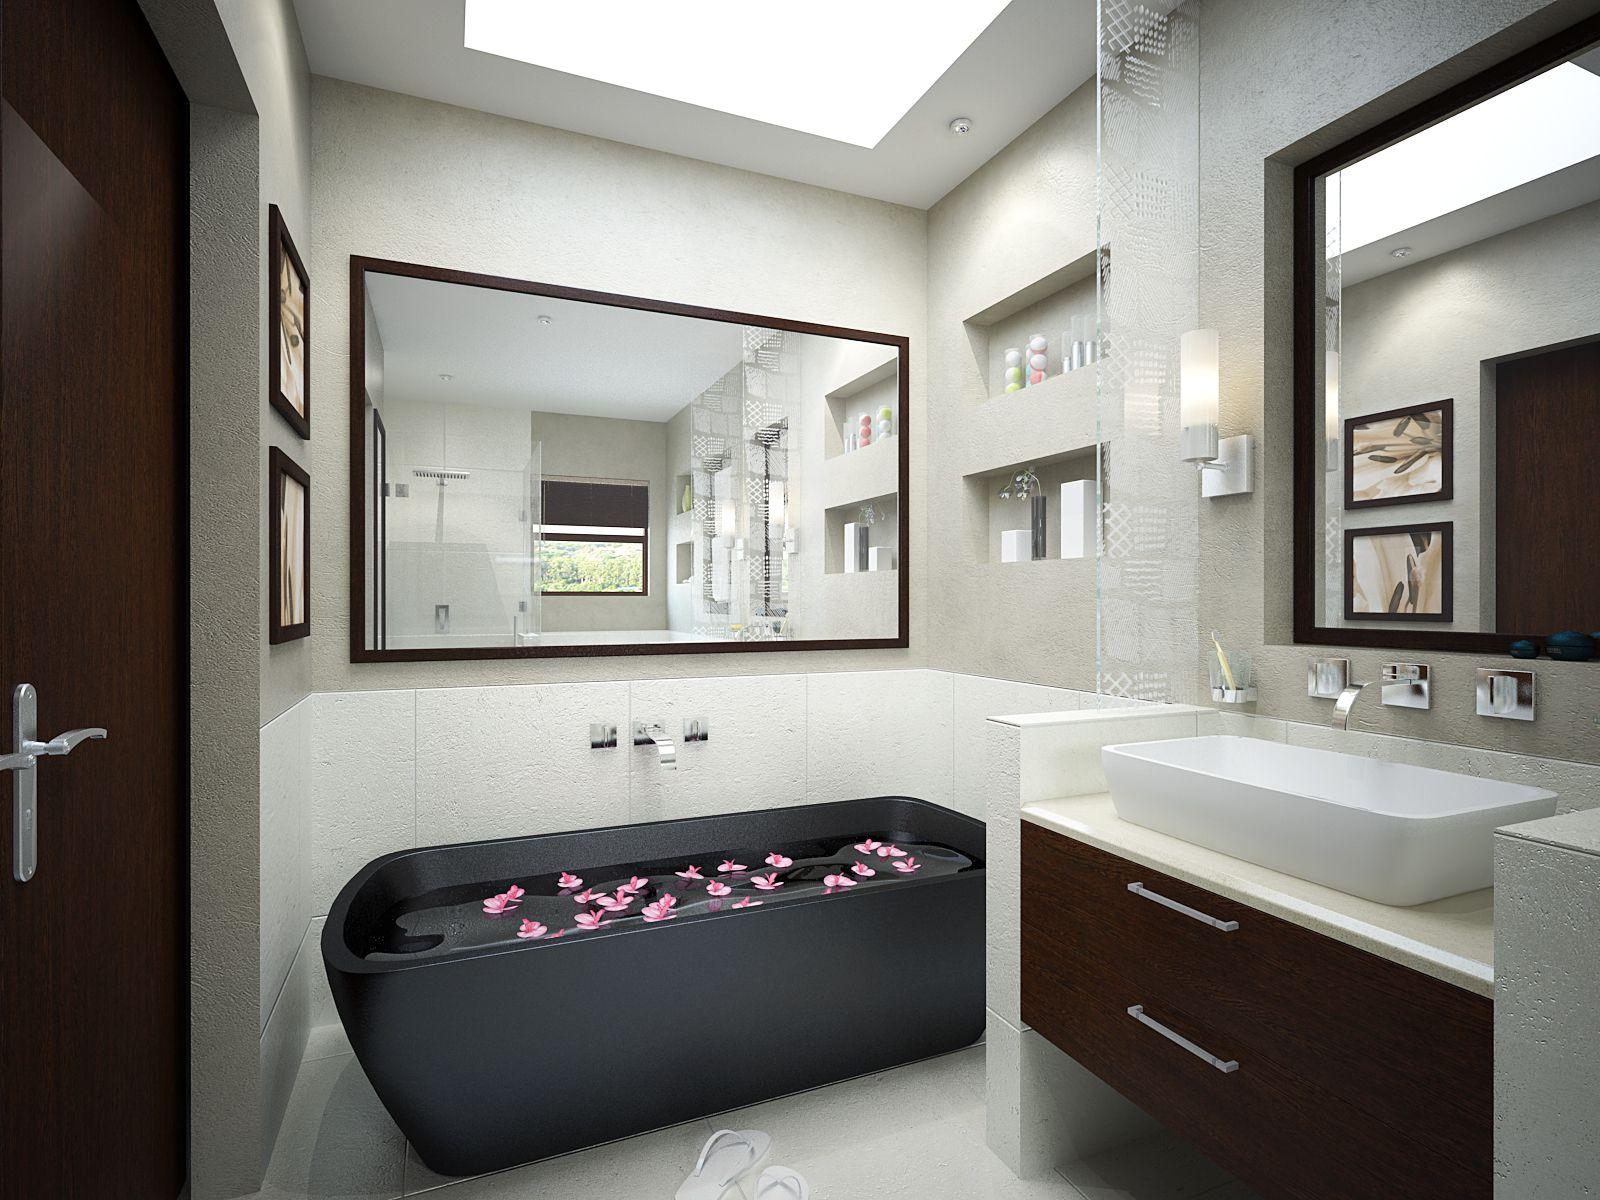 Small Bathroom Design Small Bathroom Designs Small Bathroom Designs Home Trend And Bathroom Design Luxury Bathroom Design Layout Bathroom Design Software